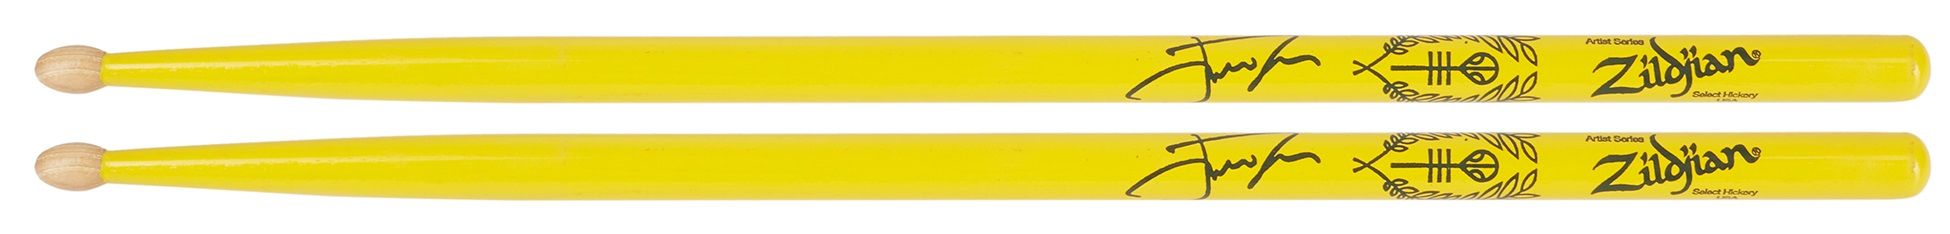 "Zildjian Josh Dun ""Trench"" Signature Drumstick"